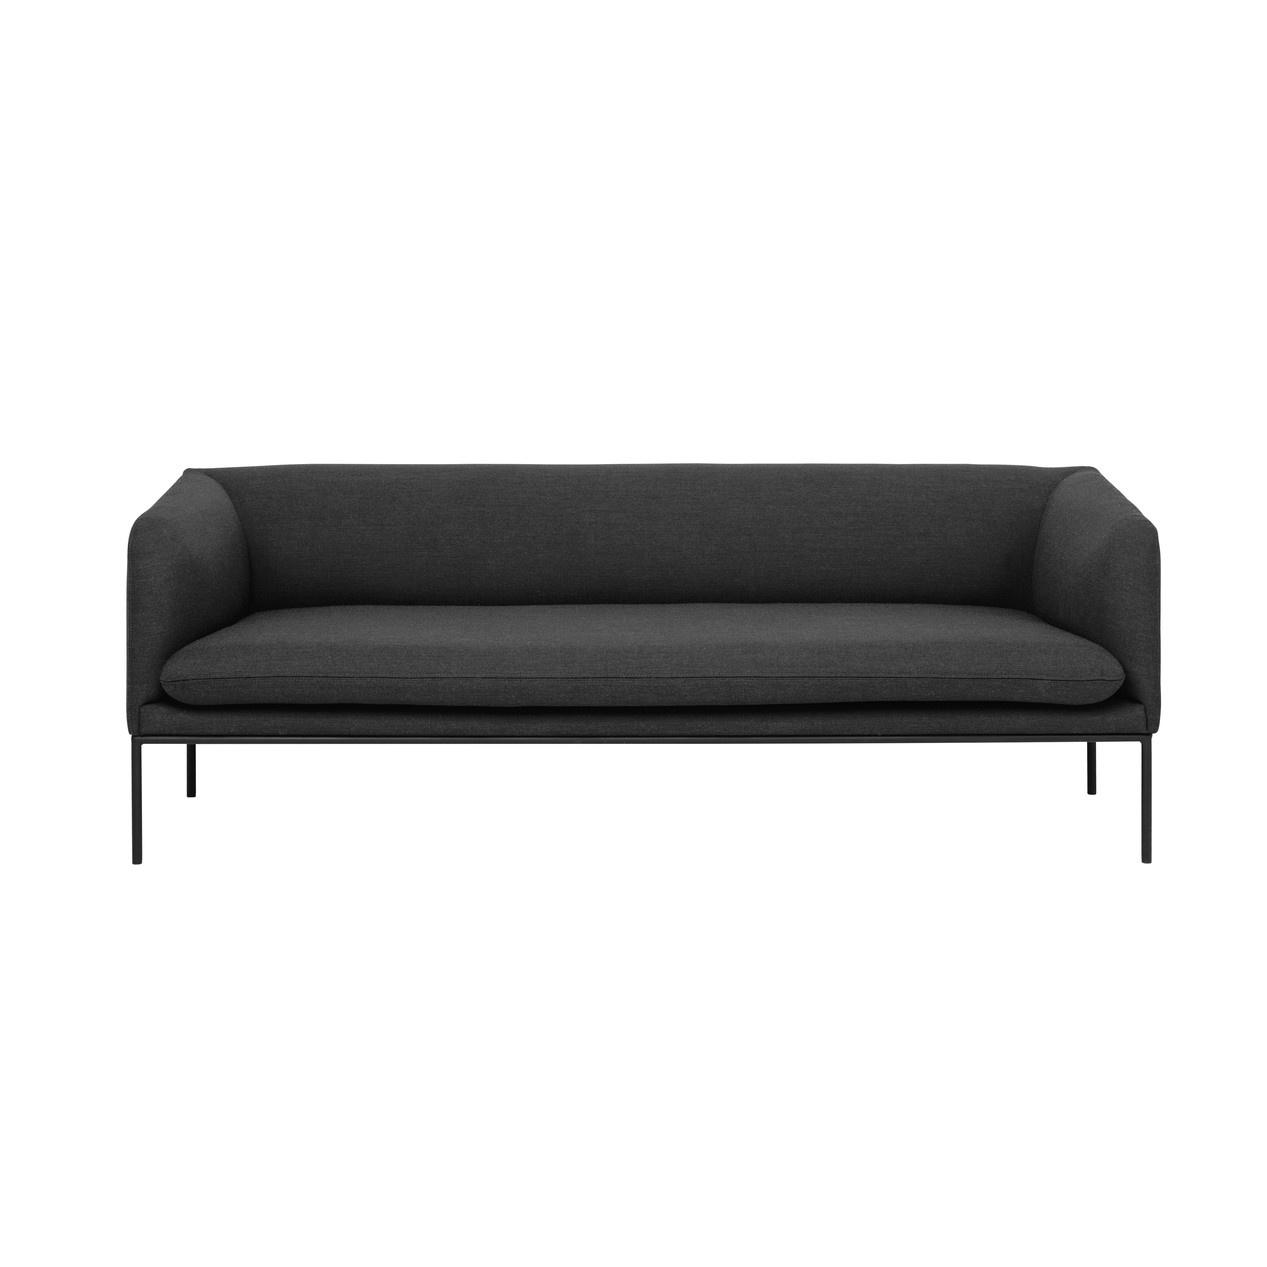 Superb Ferm Living Turn Sofa 3 Wool Solid Dark Grey Pdpeps Interior Chair Design Pdpepsorg